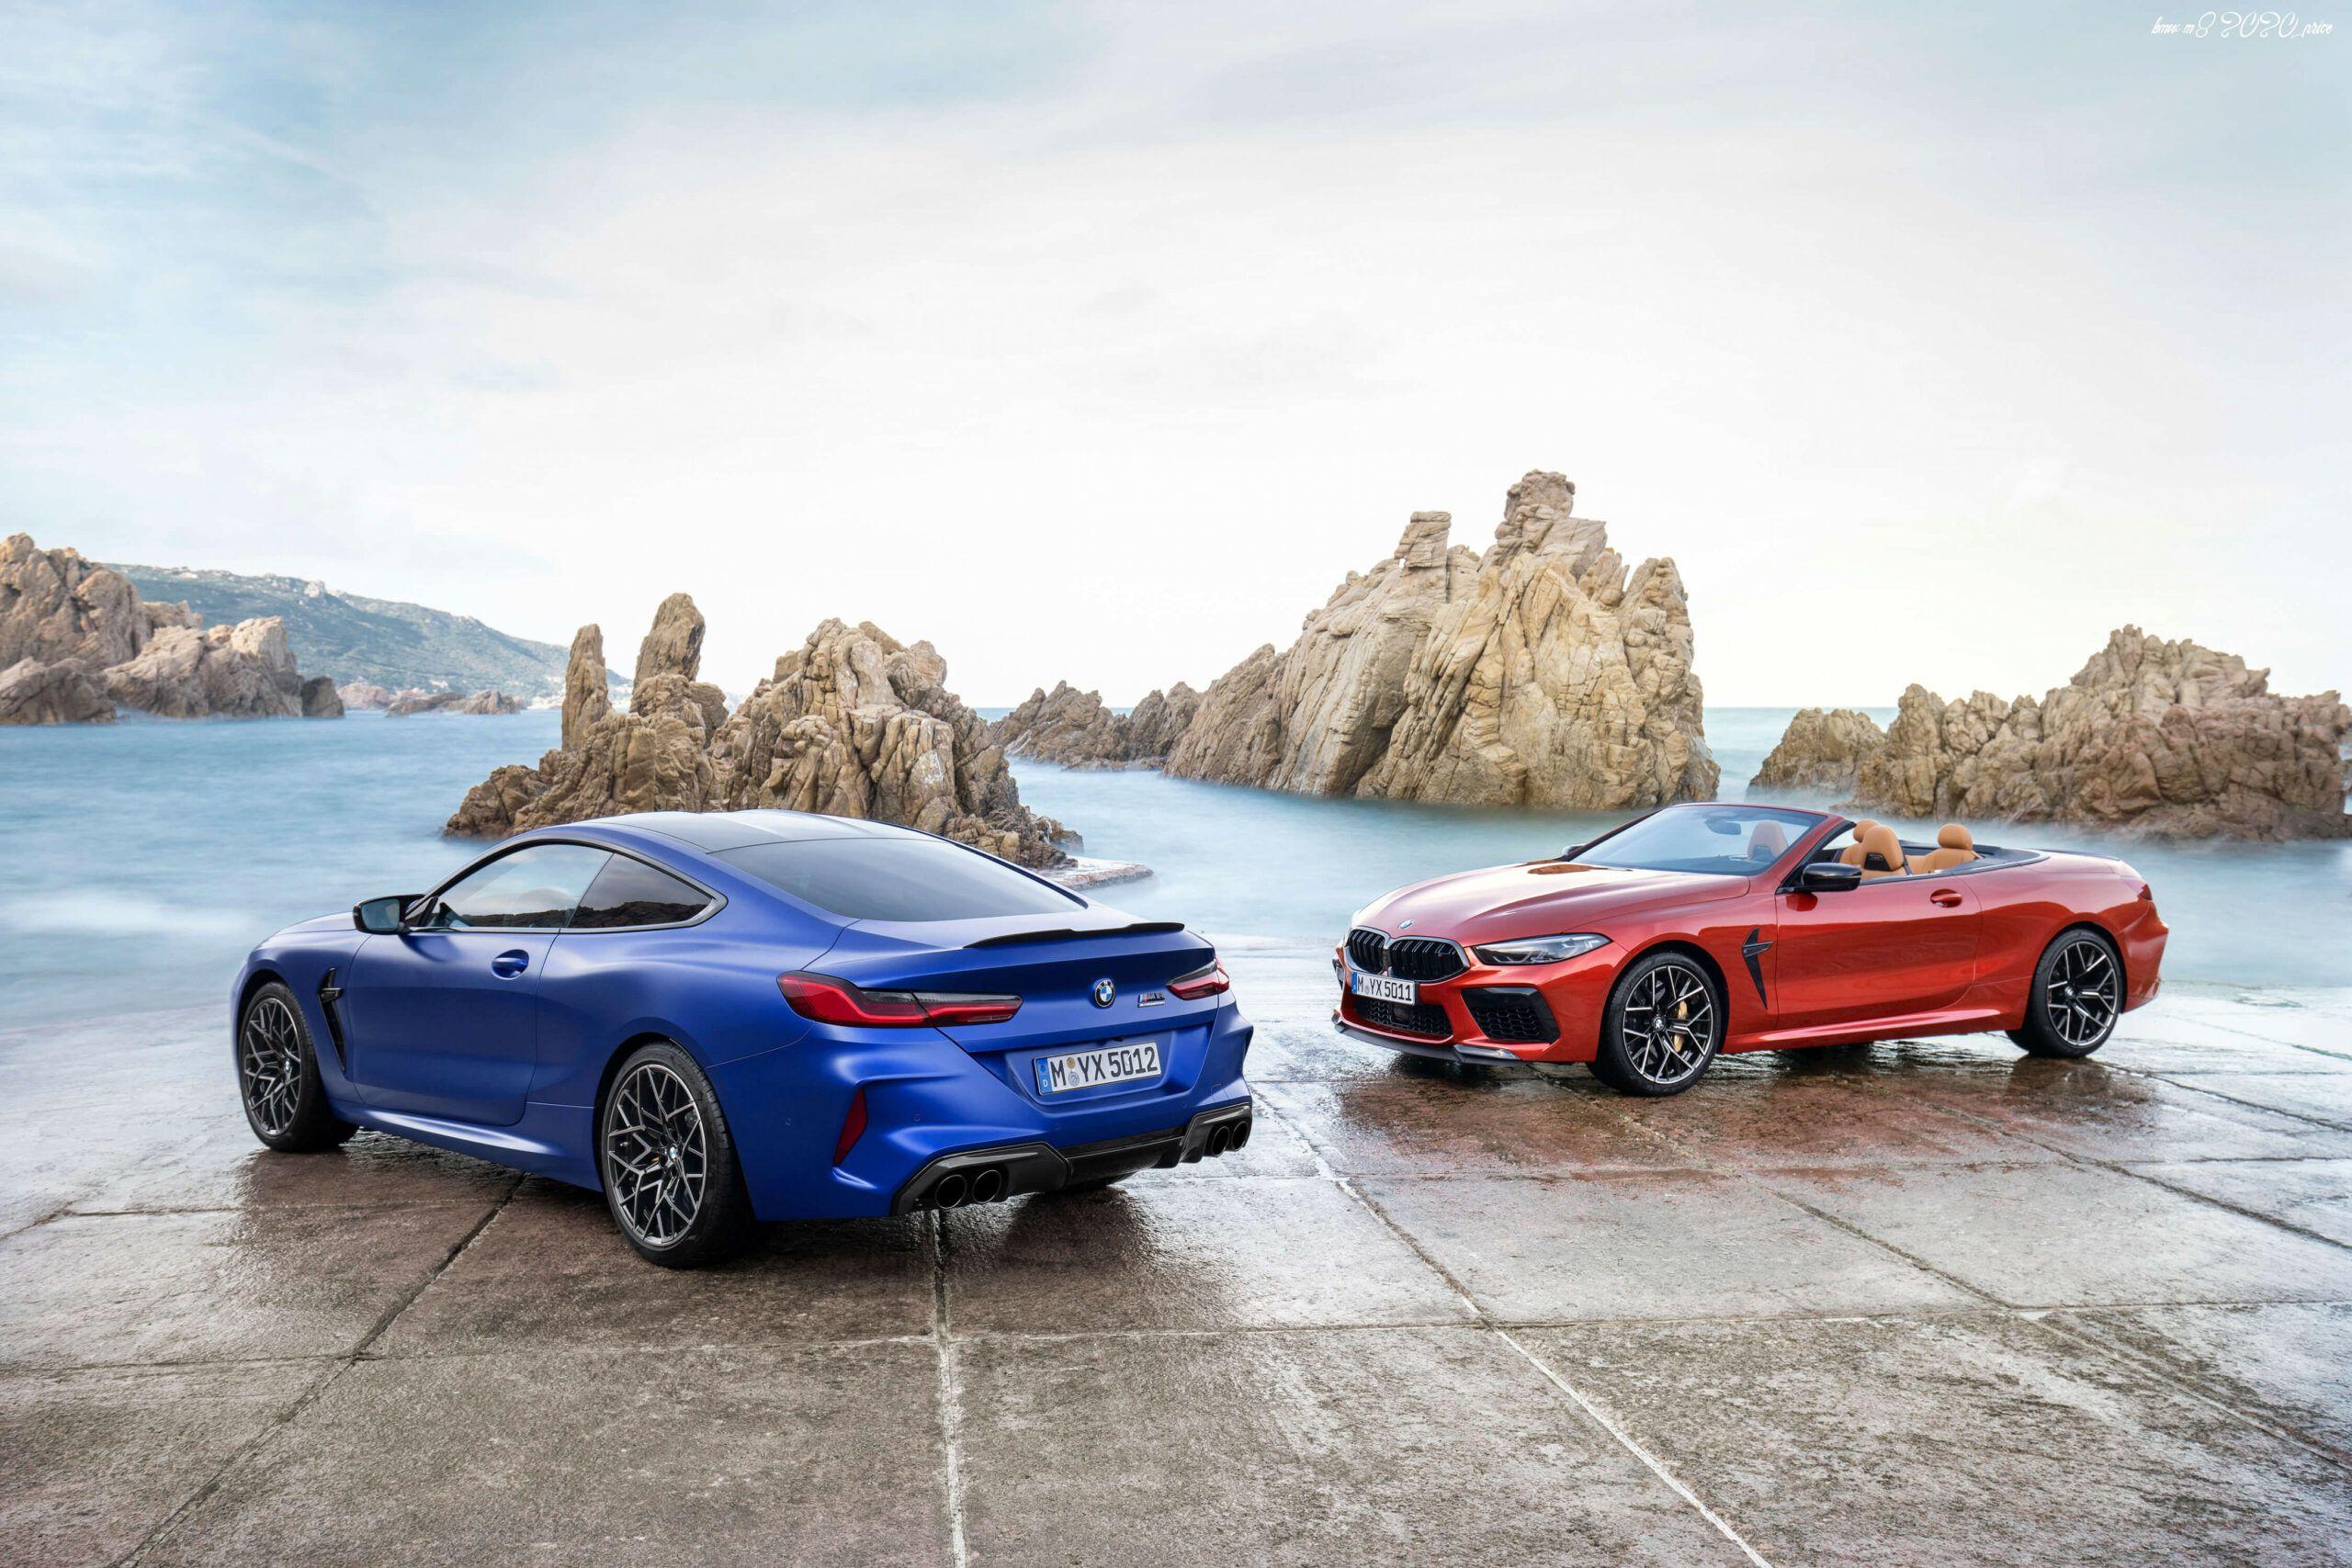 2016 Bmw M8 Supercar Specs And Price New Automotive Cars Wallpaper Hd Ilustrasi Hewan Hewan